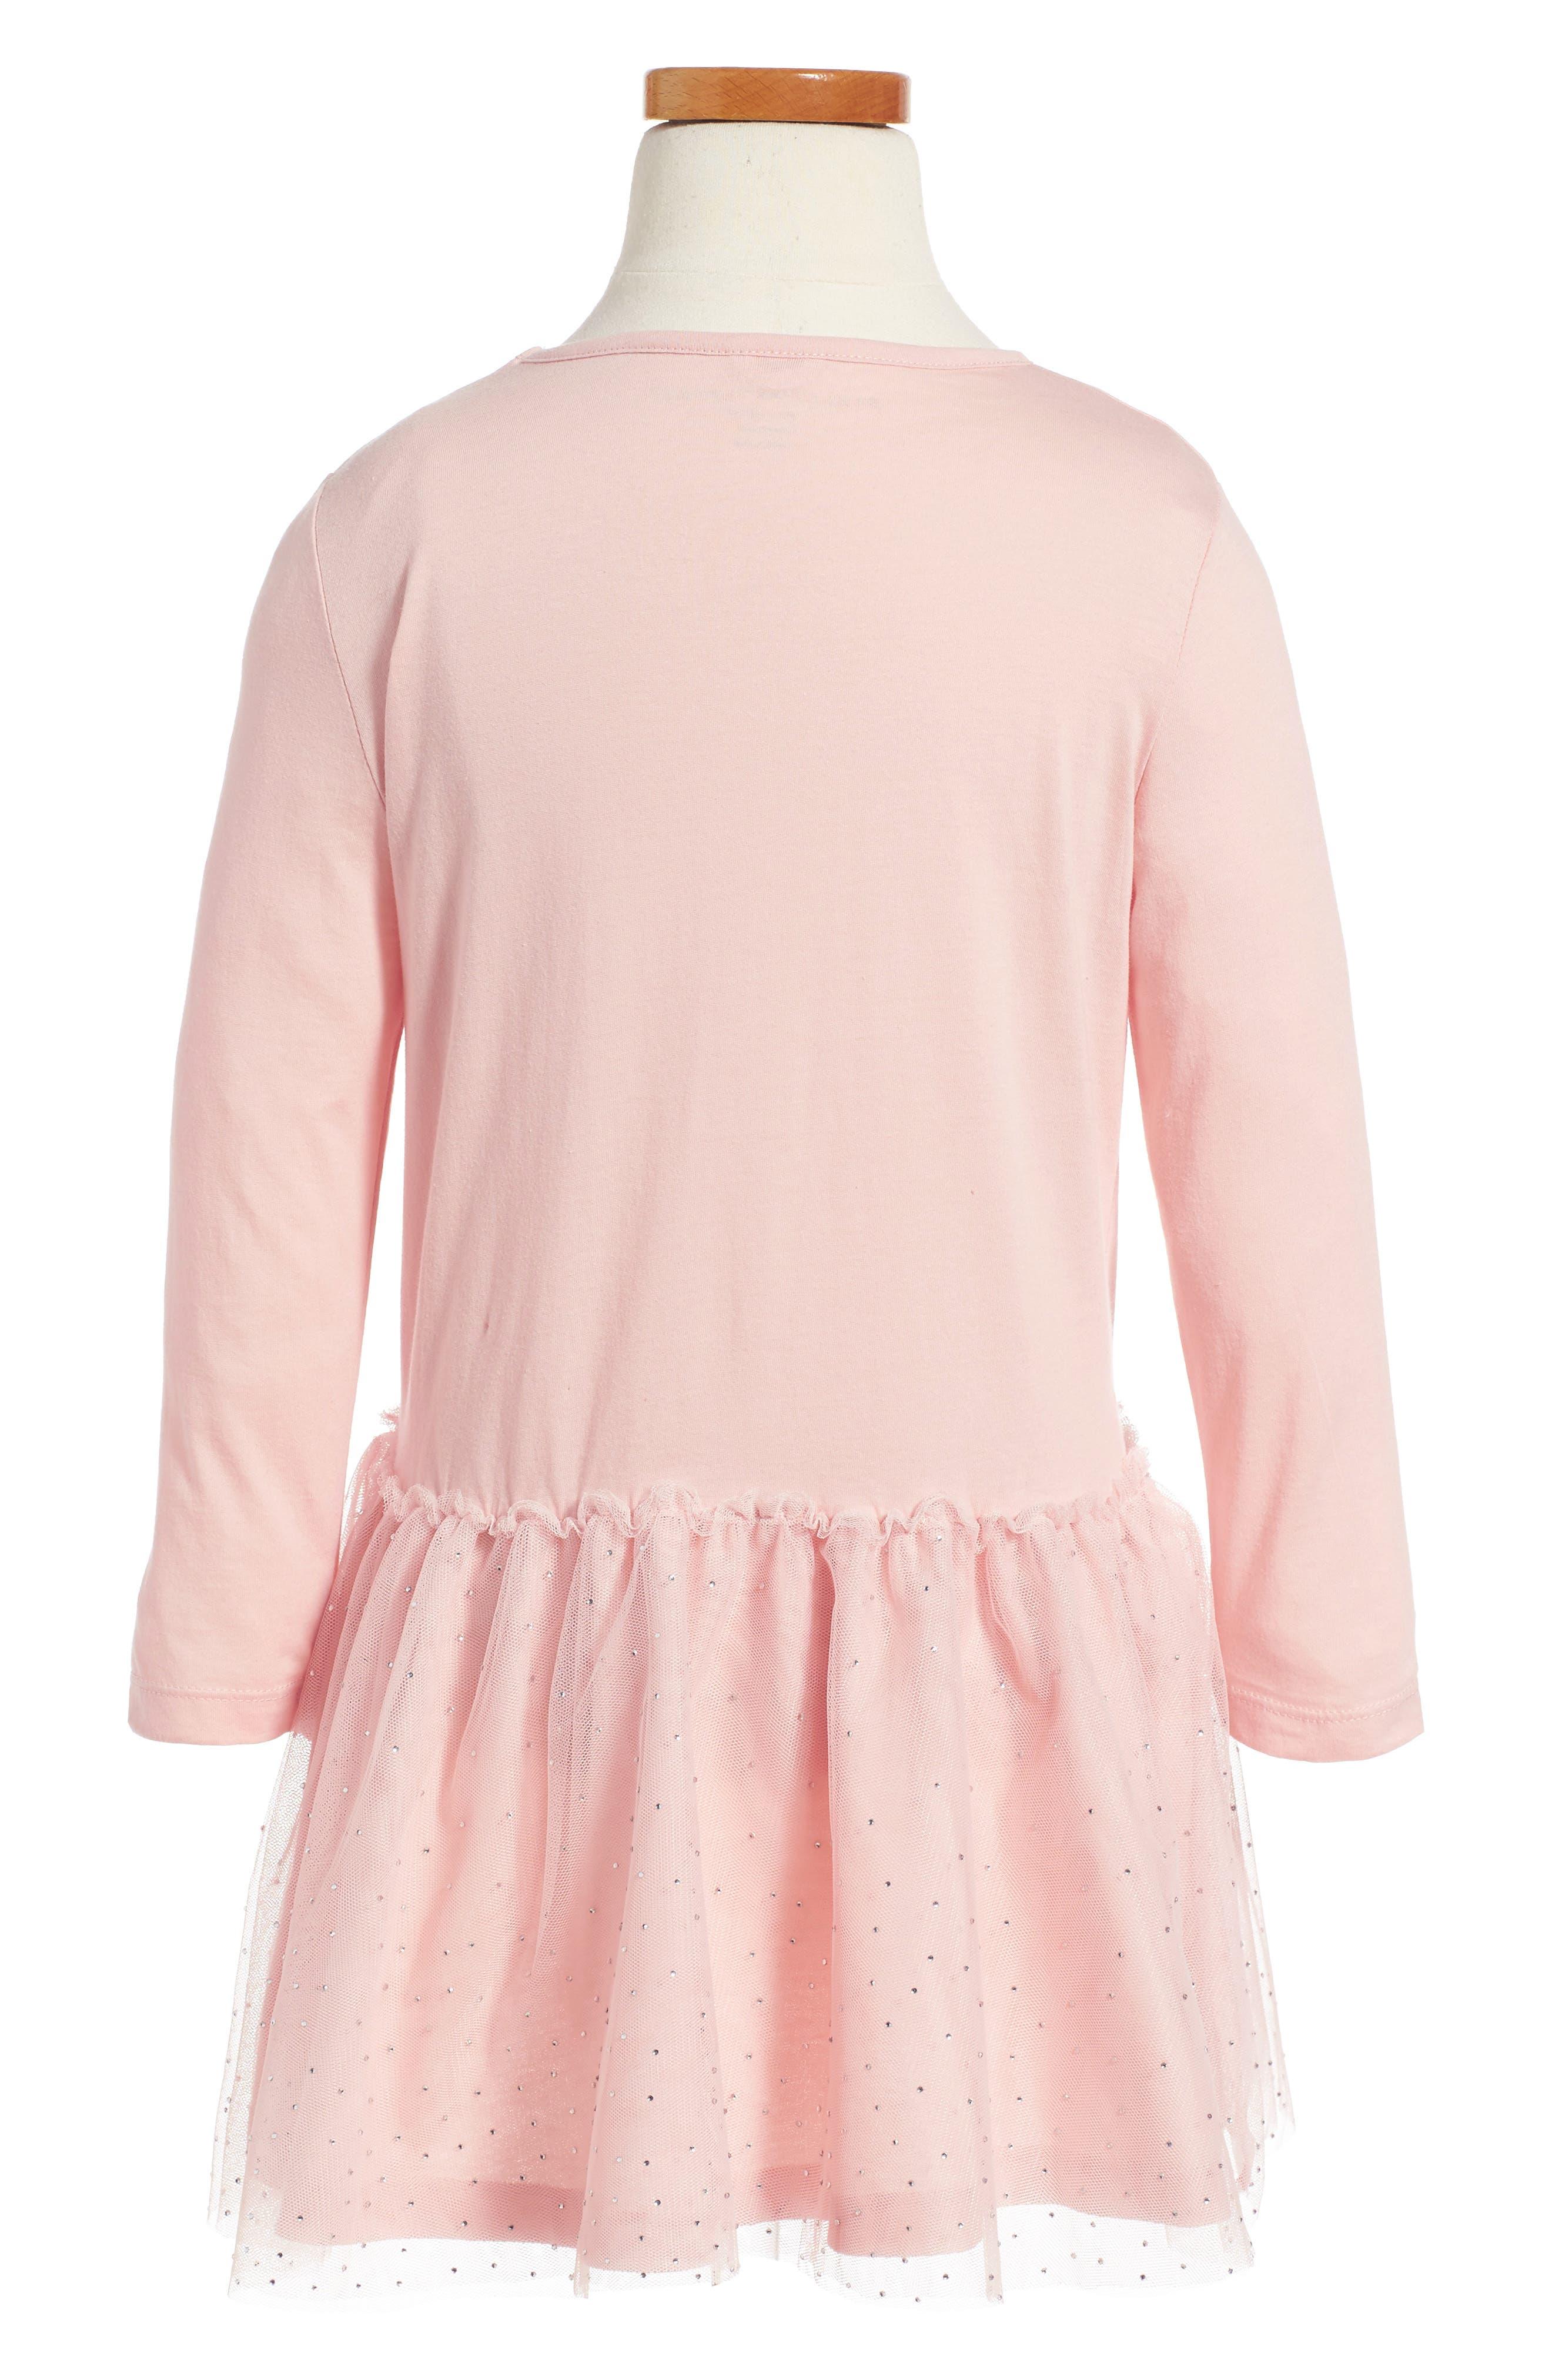 Kids Primrose Skates Dress,                             Alternate thumbnail 2, color,                             Pink